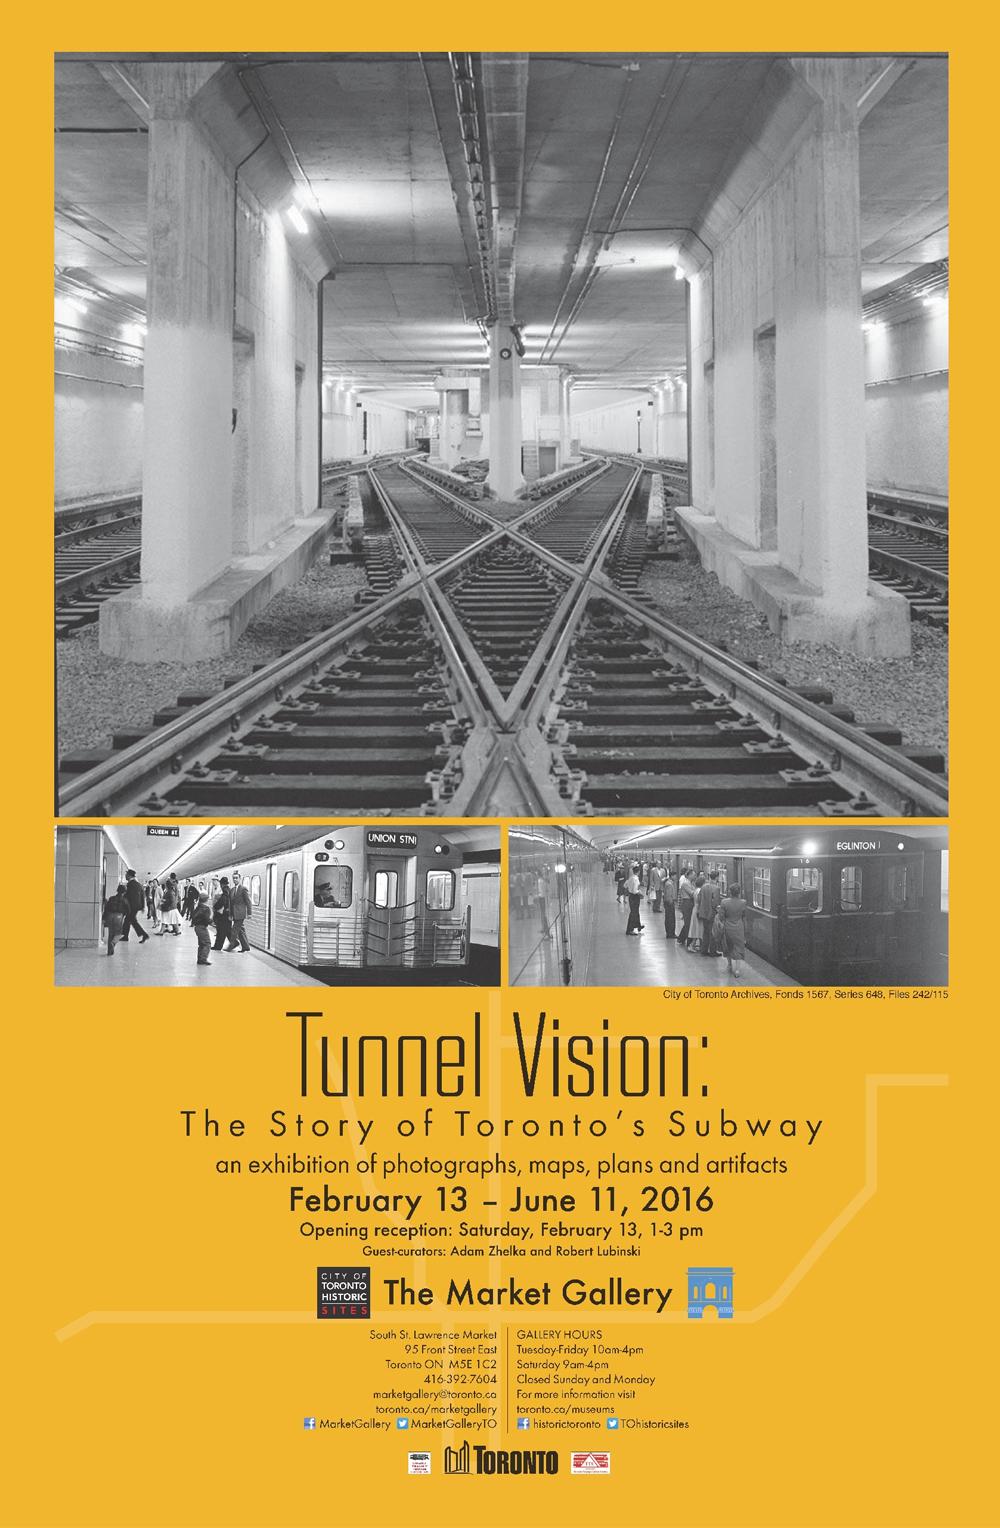 Toronto Subway Map Poster.Tunnel Vision The Story Of Toronto S Subway Pivot Design Group